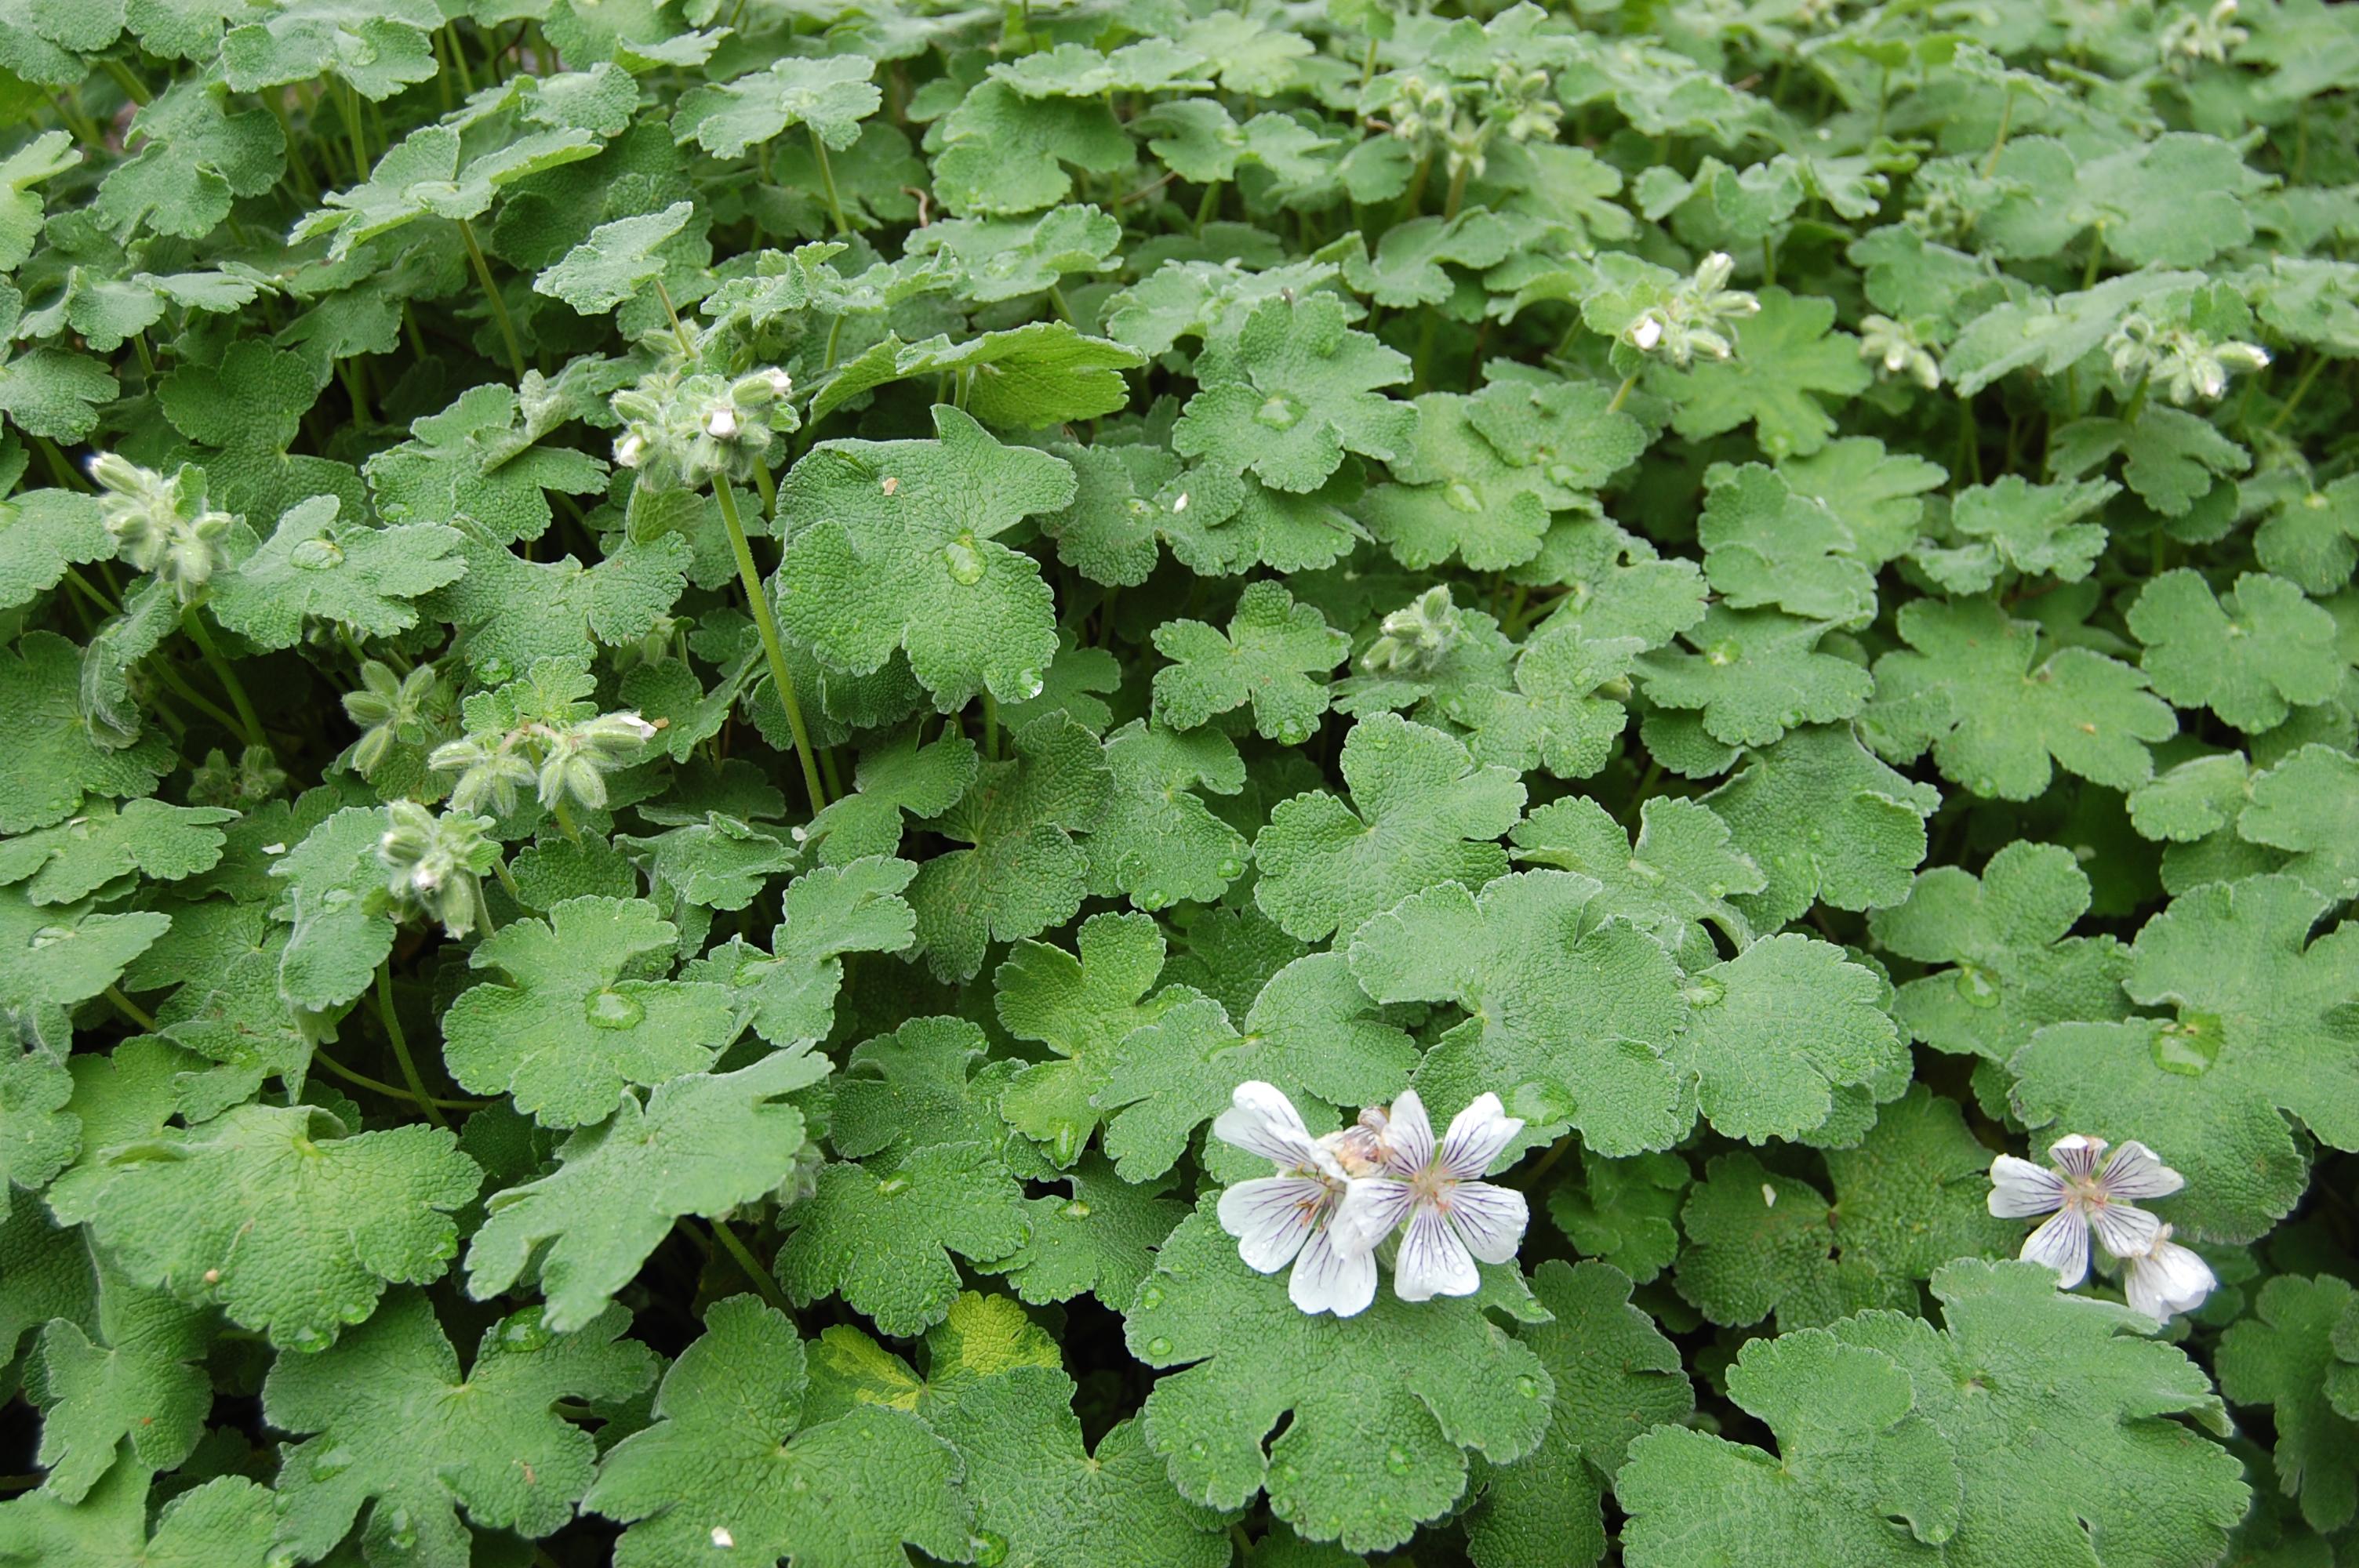 Geranium renardii (05/05/2012, Kew Gardens, London)